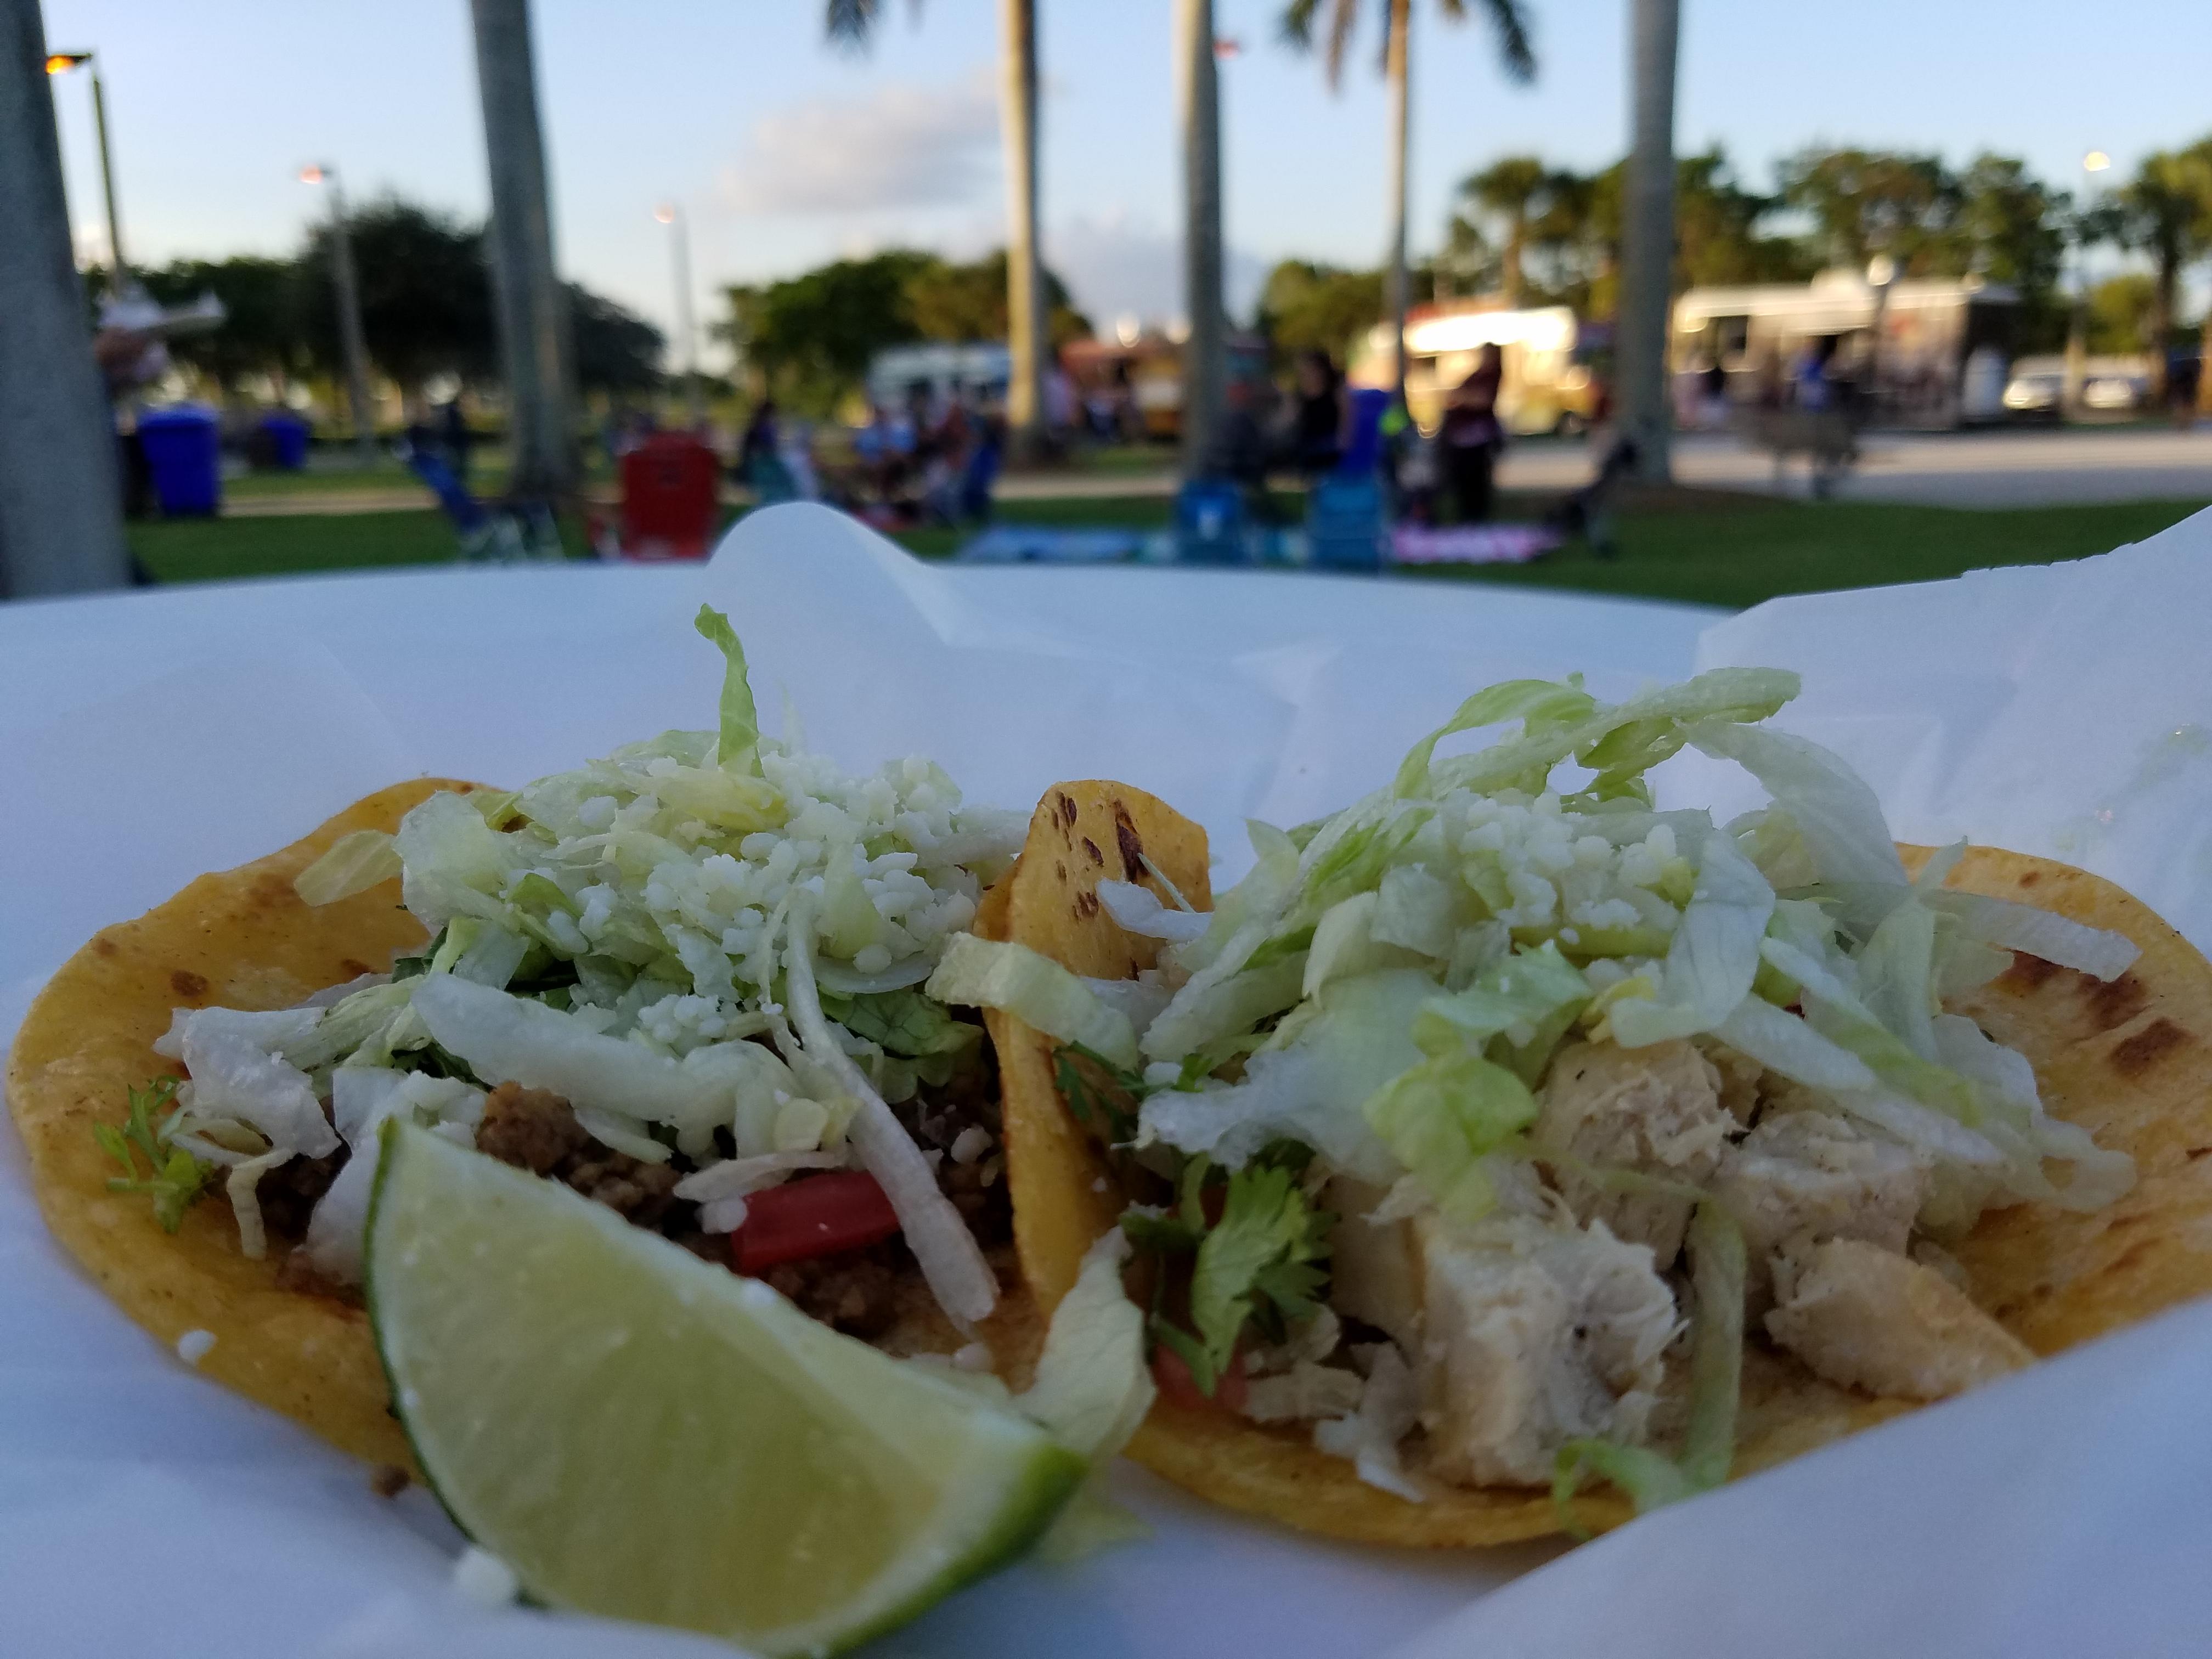 Food Truck Invasion Boca Raton